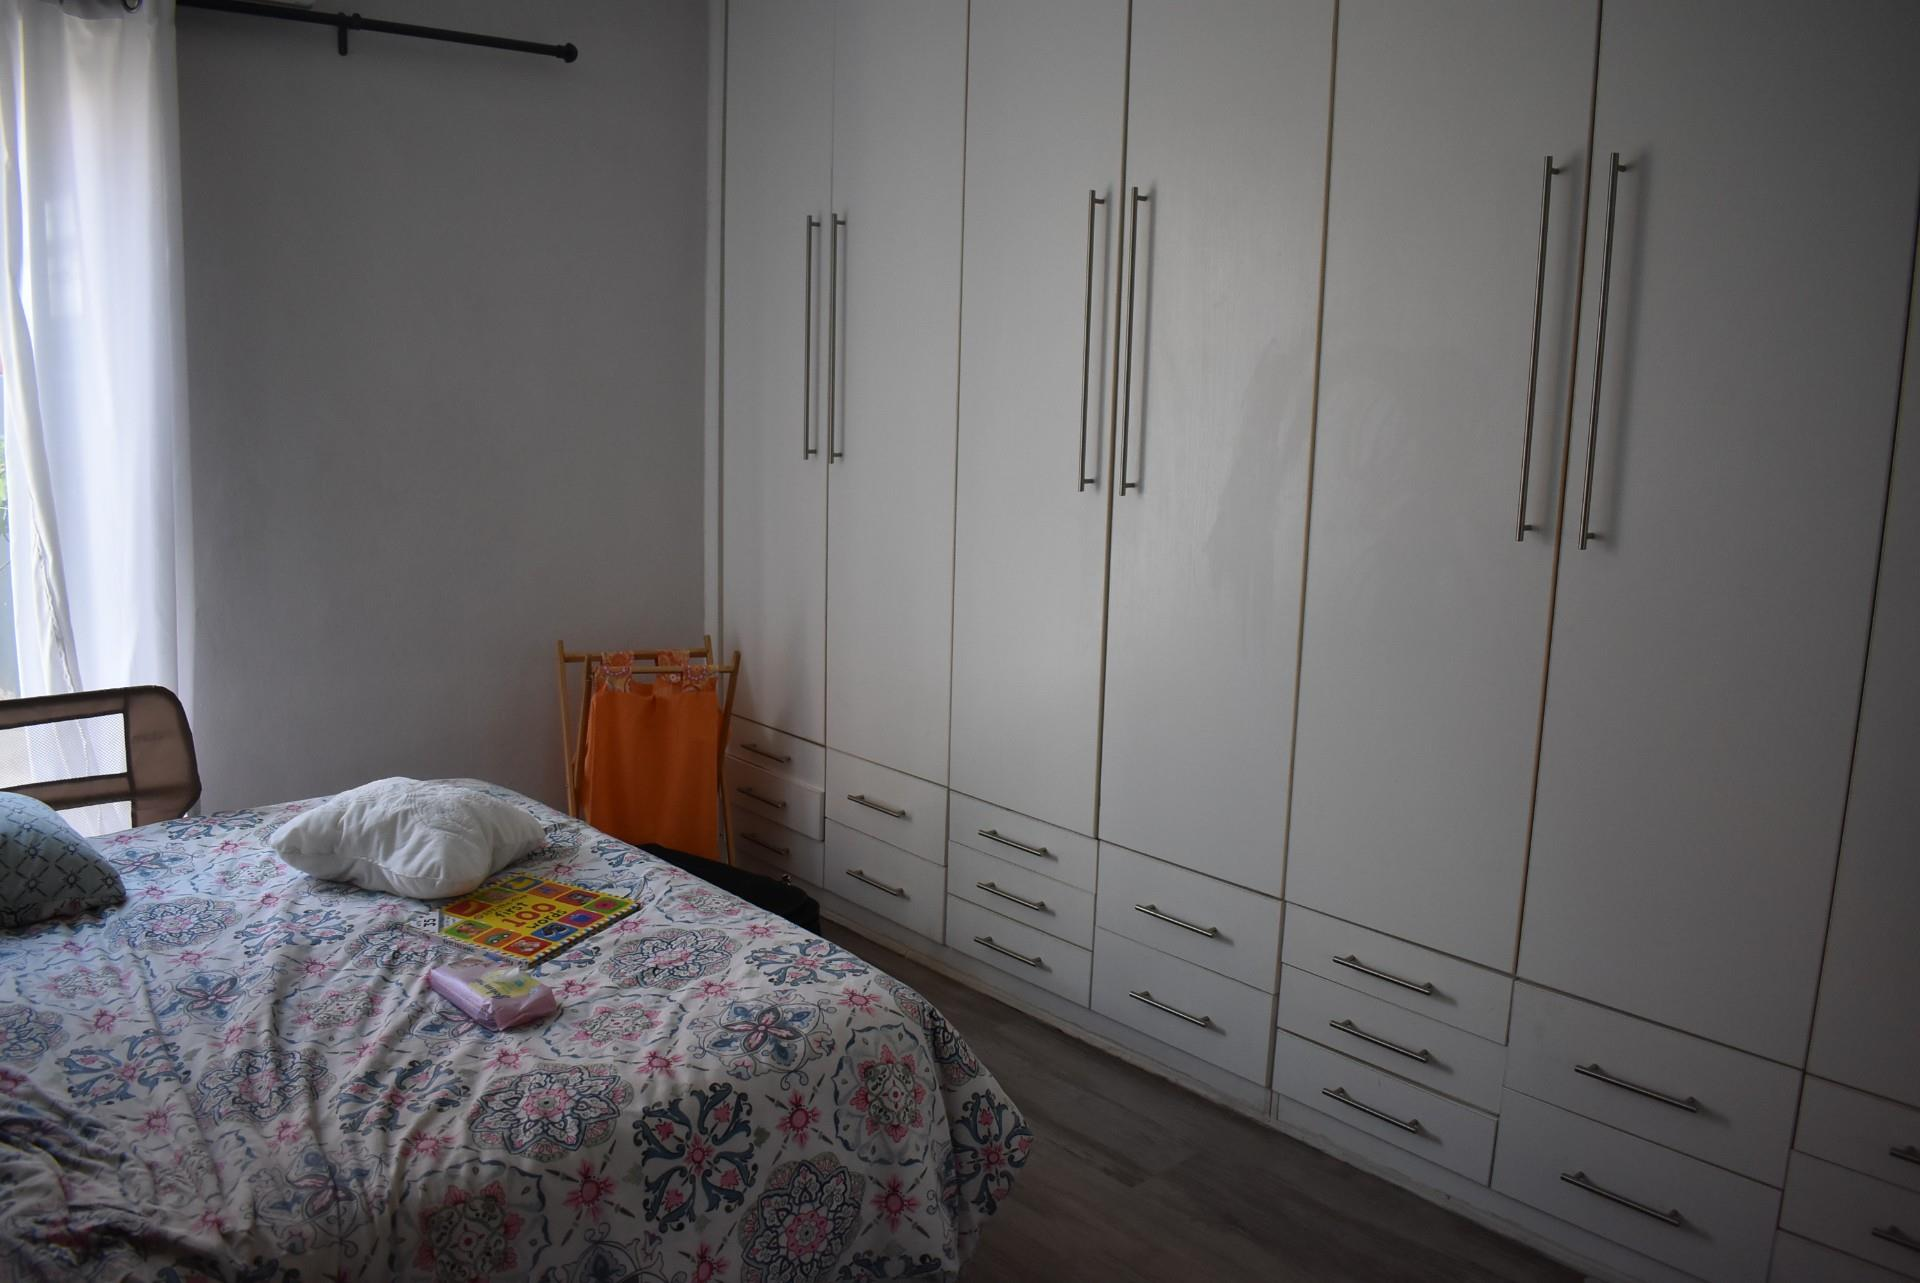 4 Bedroom Town house For Sale in Avis